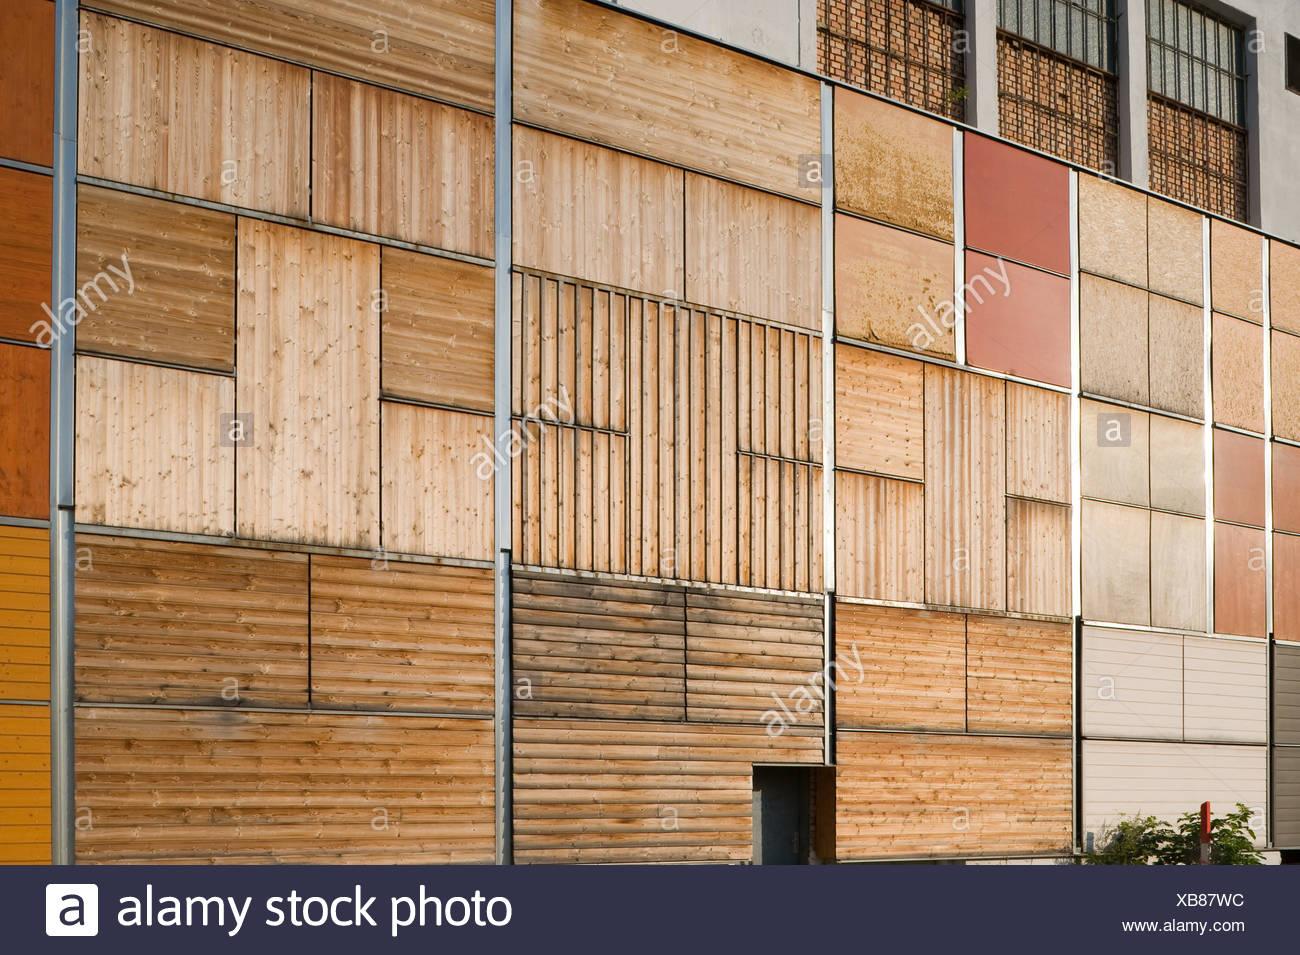 holzfassade - holz fassade stockfoto, bild: 282308920 - alamy